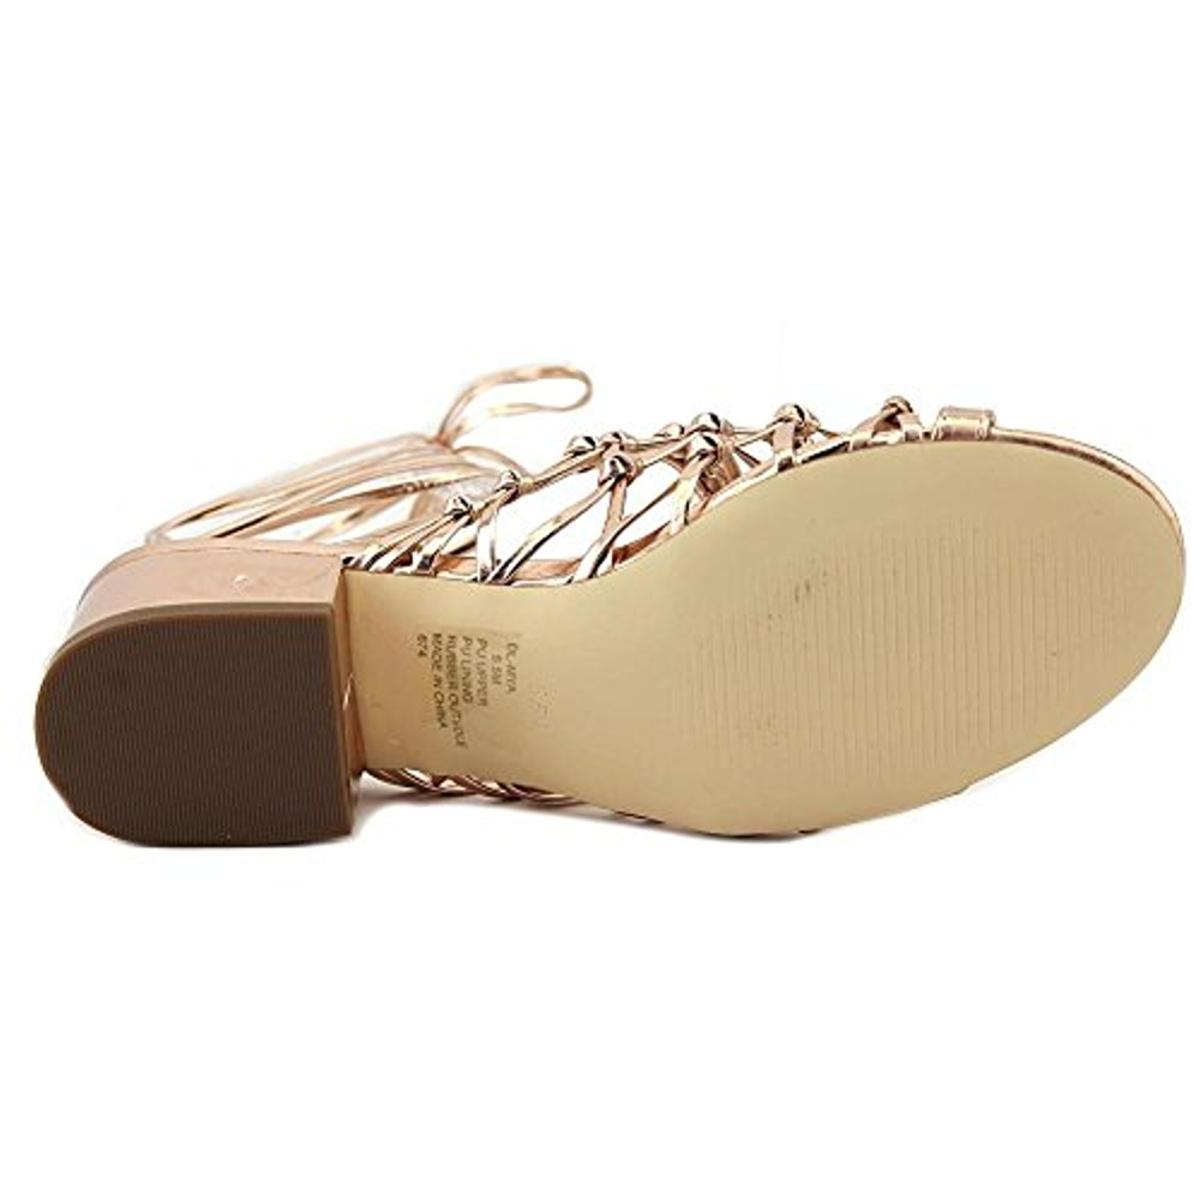 Design-Lab-Womens-Mya-Wrap-Open-Toe-Dress-Heels-Shoes-BHFO-2941 thumbnail 13